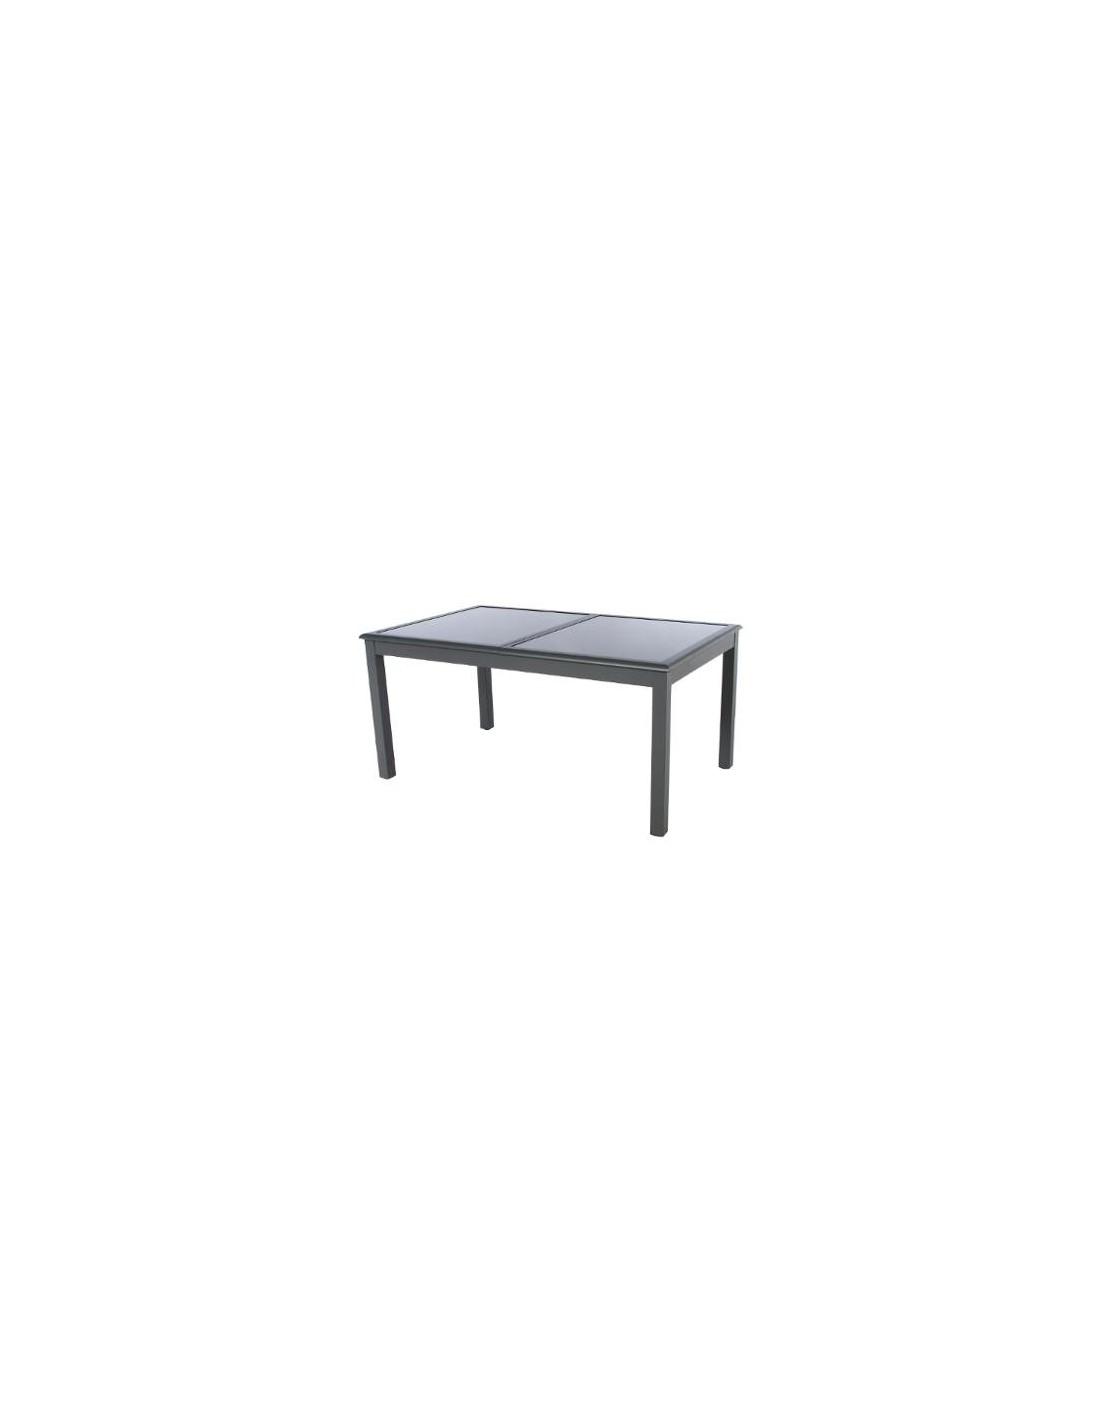 table azua extensible 10 personnes aluminium verre coloris au choix hesp ride. Black Bedroom Furniture Sets. Home Design Ideas